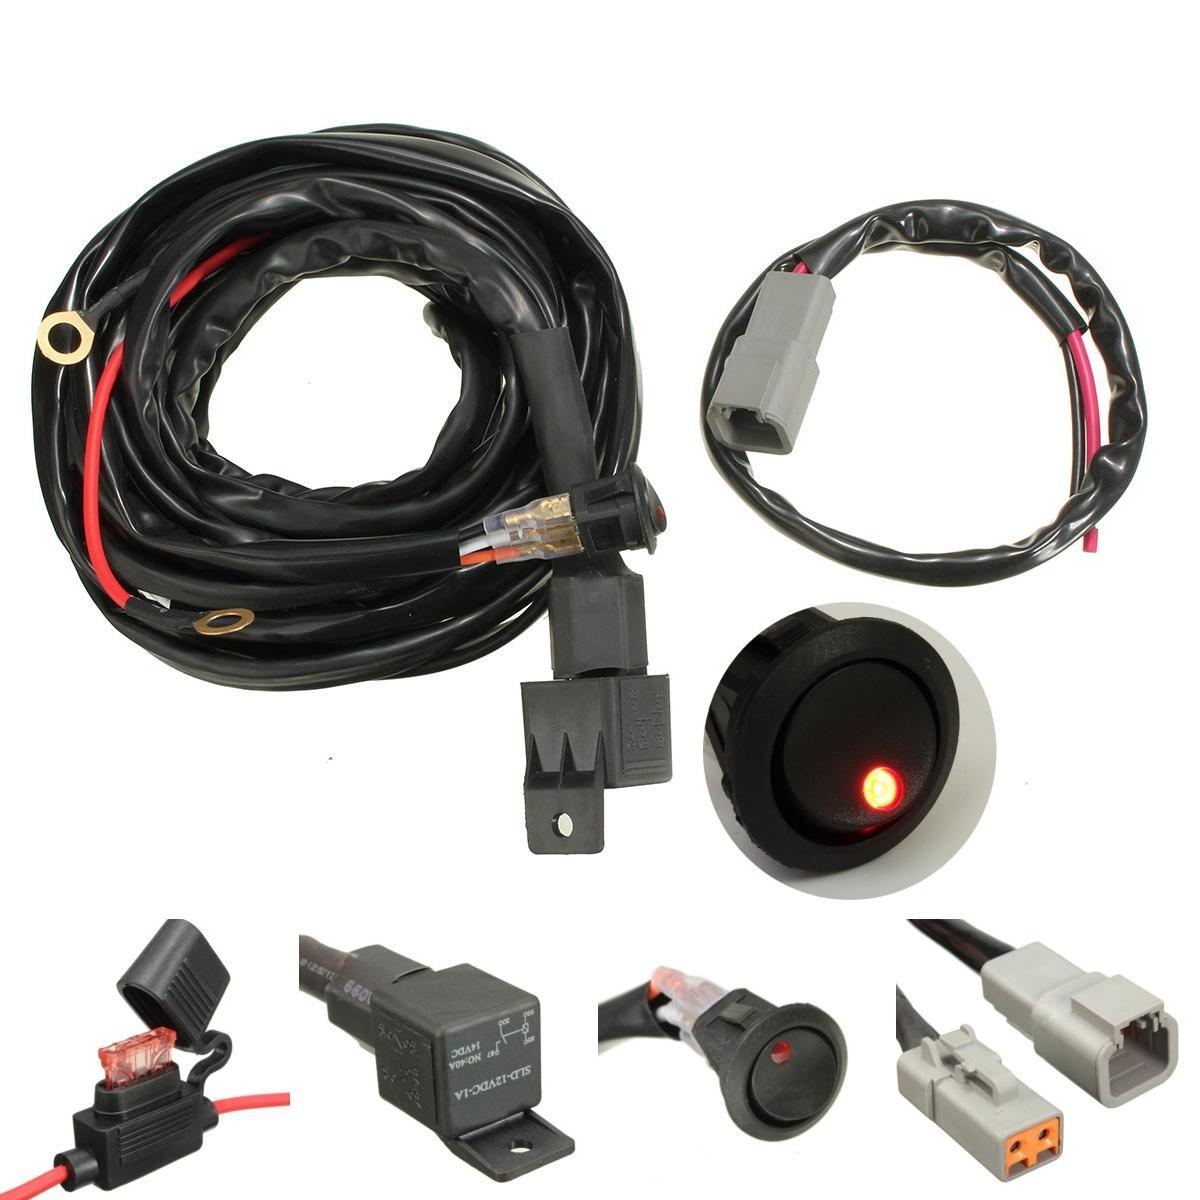 40A Relay 300cm Wiring Harness Kit ON OFF Switch For LED Spot Lightts on fuel line kit, transmission kit, timing belt kit, hose kit, wiring connector kit, coil kit, air bag kit, wiring tools kit, strat wiring kit, oil cooler kit, fan kit, exhaust kit, bumper kit, wiring thermostat, wiring light kit, car wiring kit, timing chain kit, headlights kit,